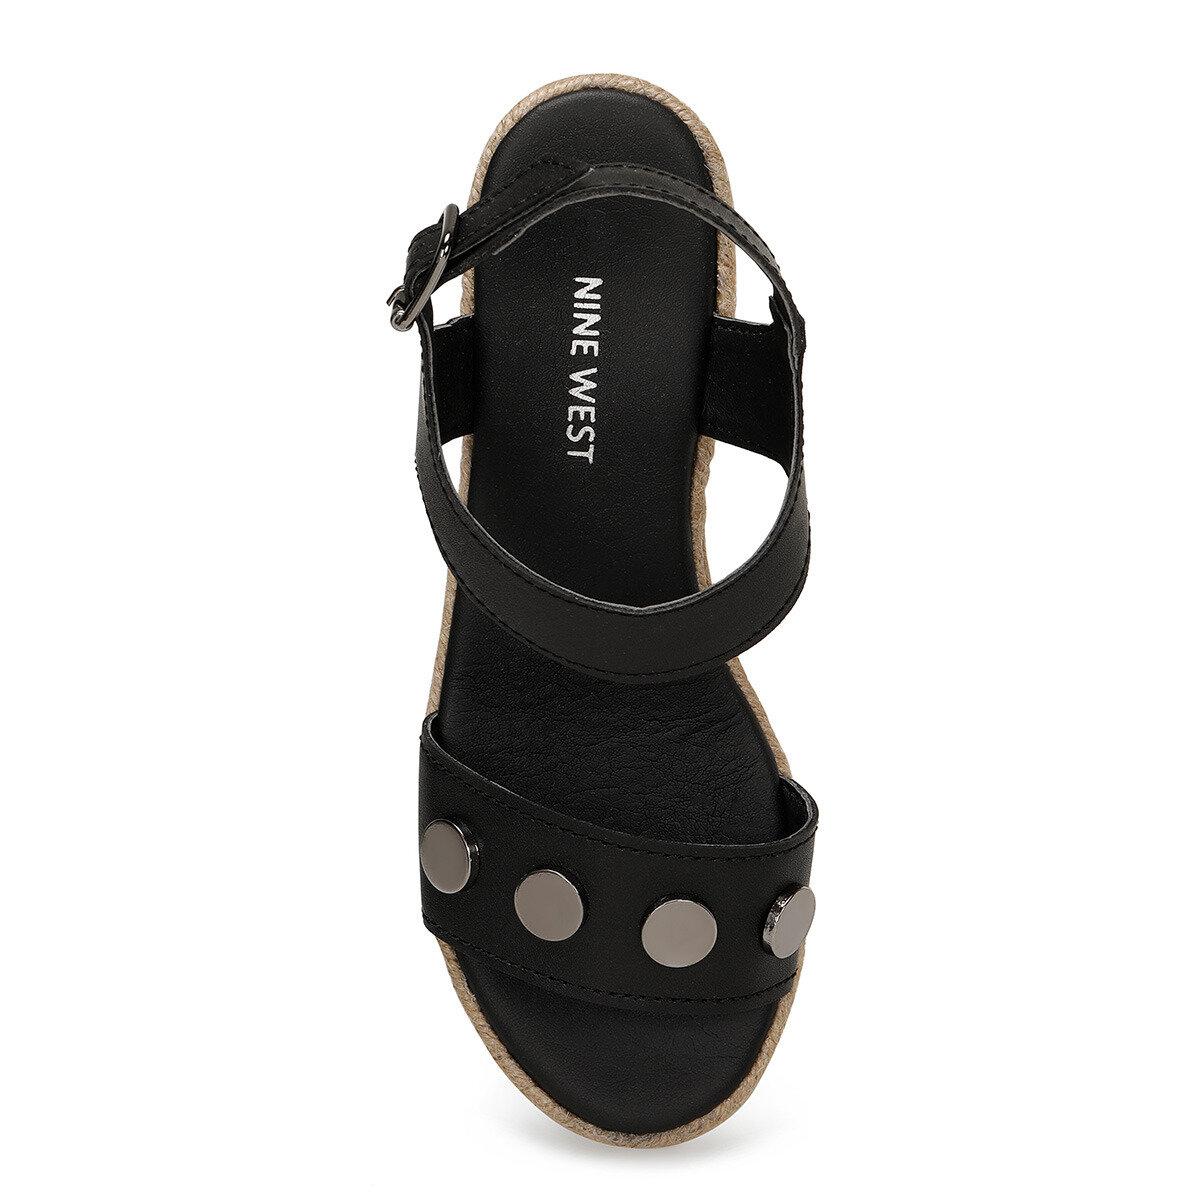 VALADON Siyah Kadın Dolgu Topuklu Sandalet